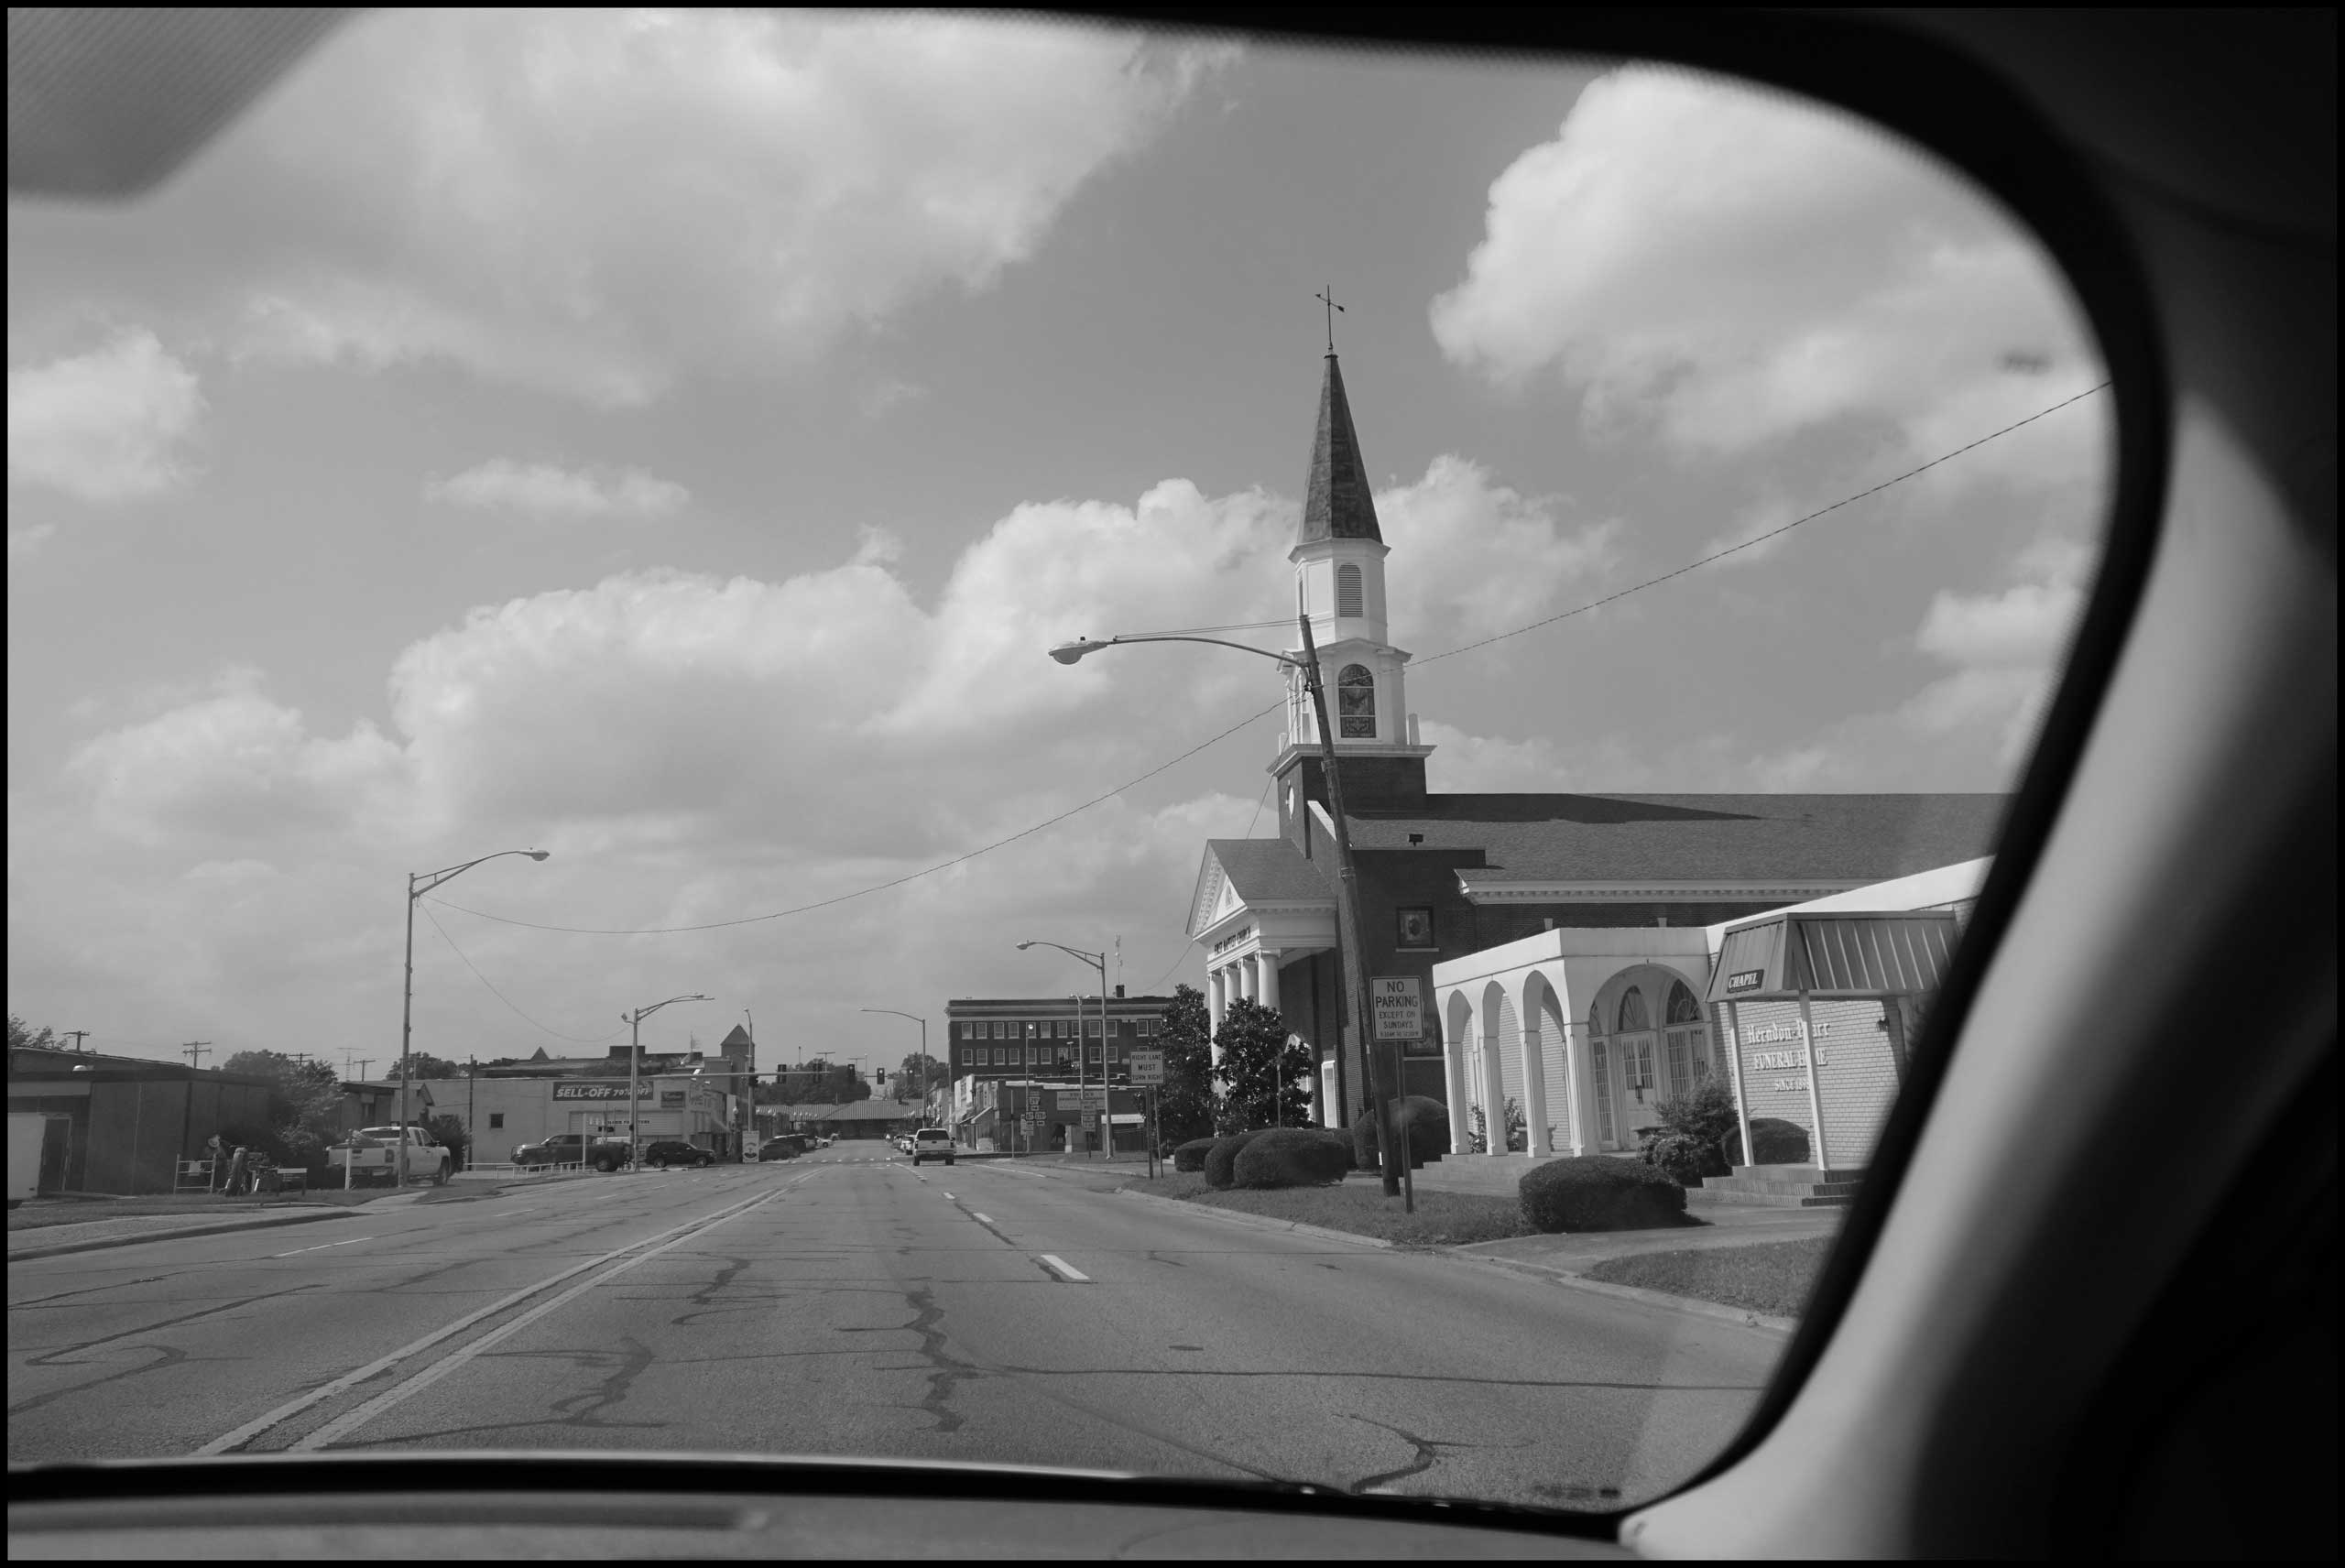 Downtown Hope, Ark. 2016.